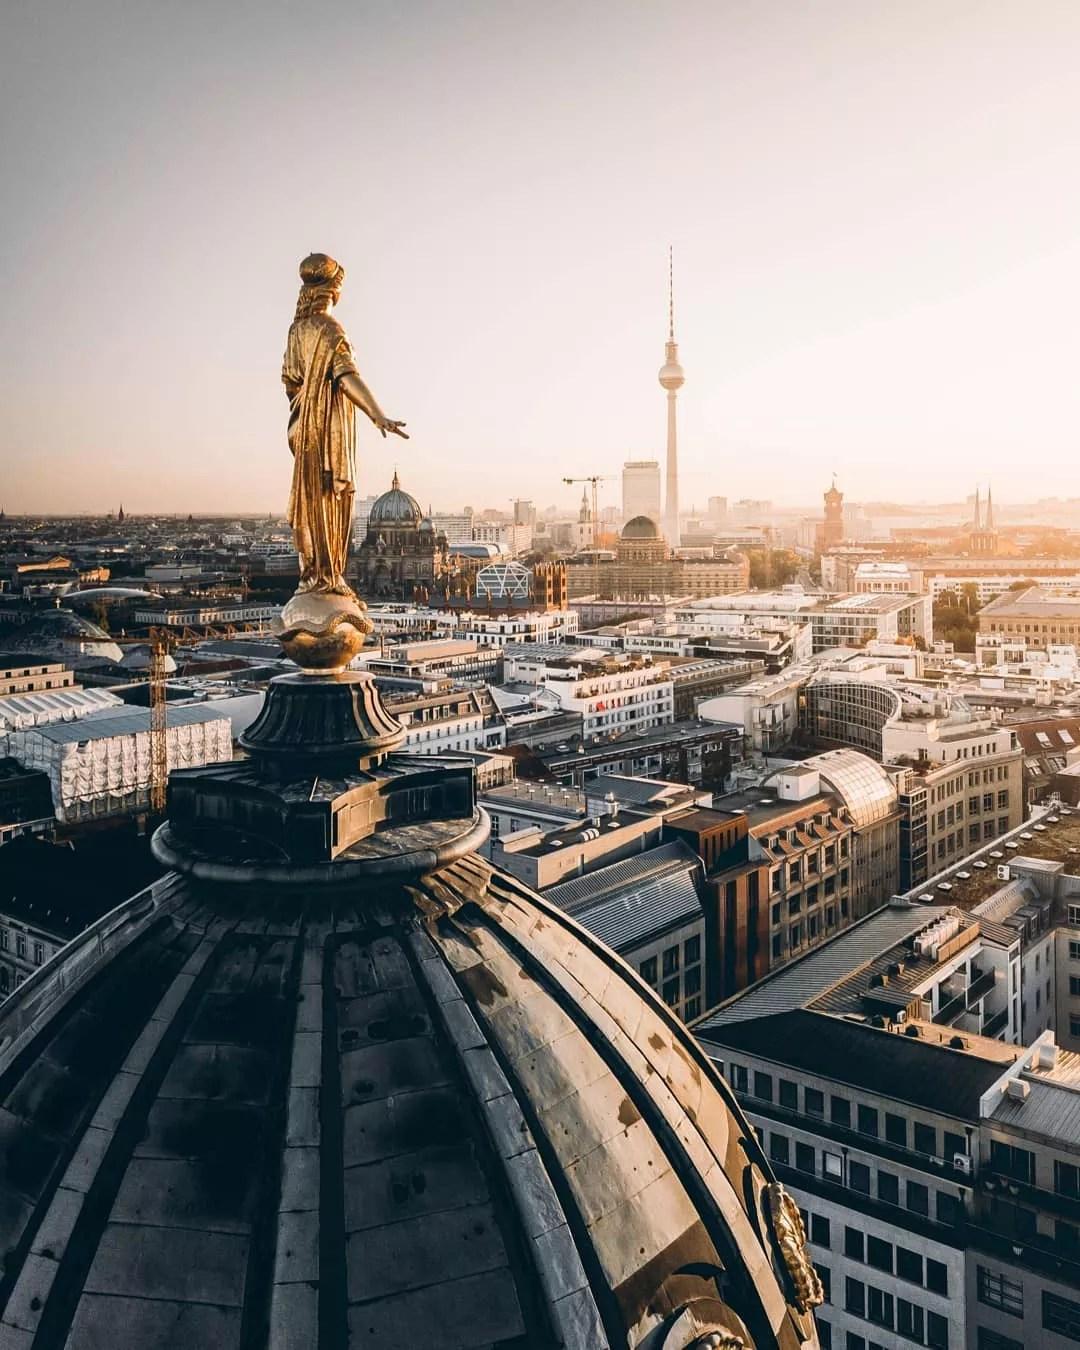 Skyline of Berlin gold statue on church. Photo by Instagram user @ferditakesphotos